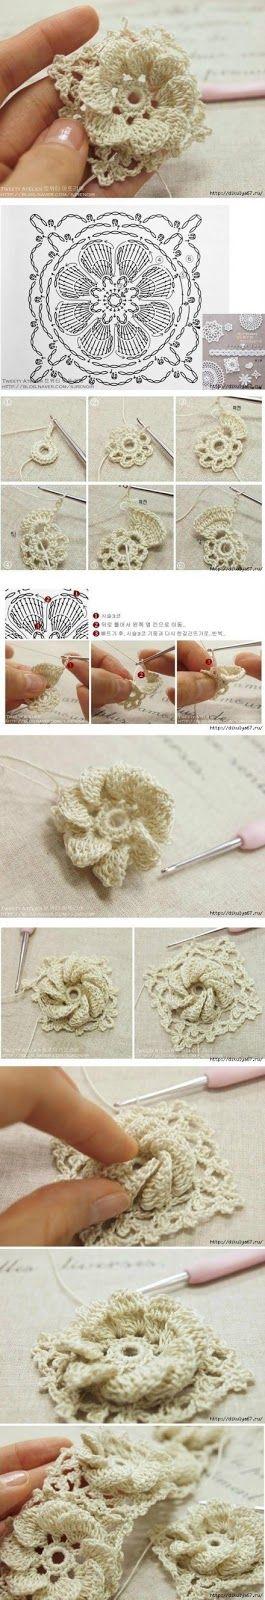 325 best crochet irlandes images on Pinterest   Irish crochet ...